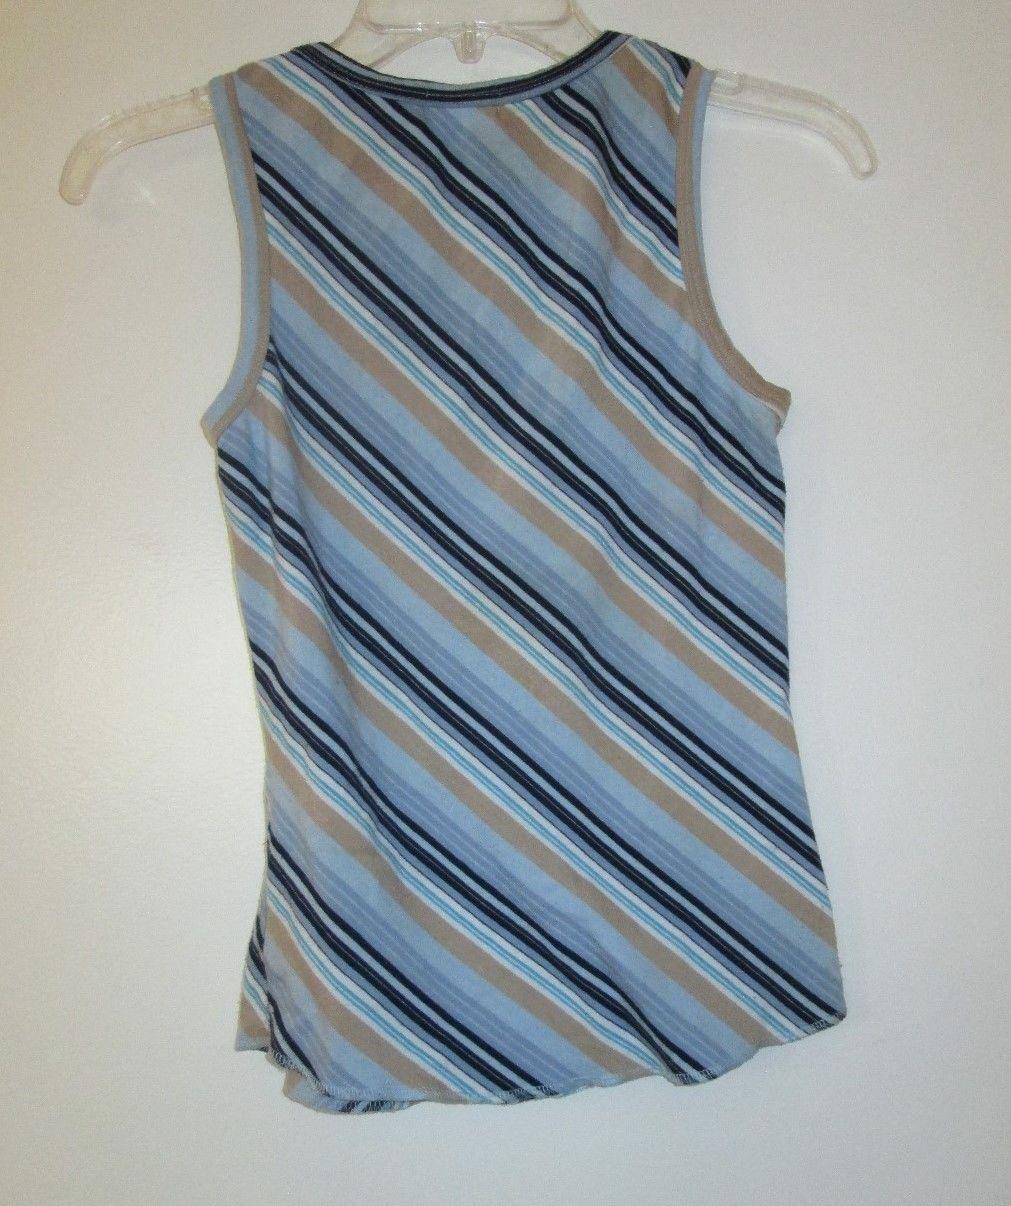 vintage 1990s retro blue stripe sleeveless tank shirt size extra small xs 0 2 4